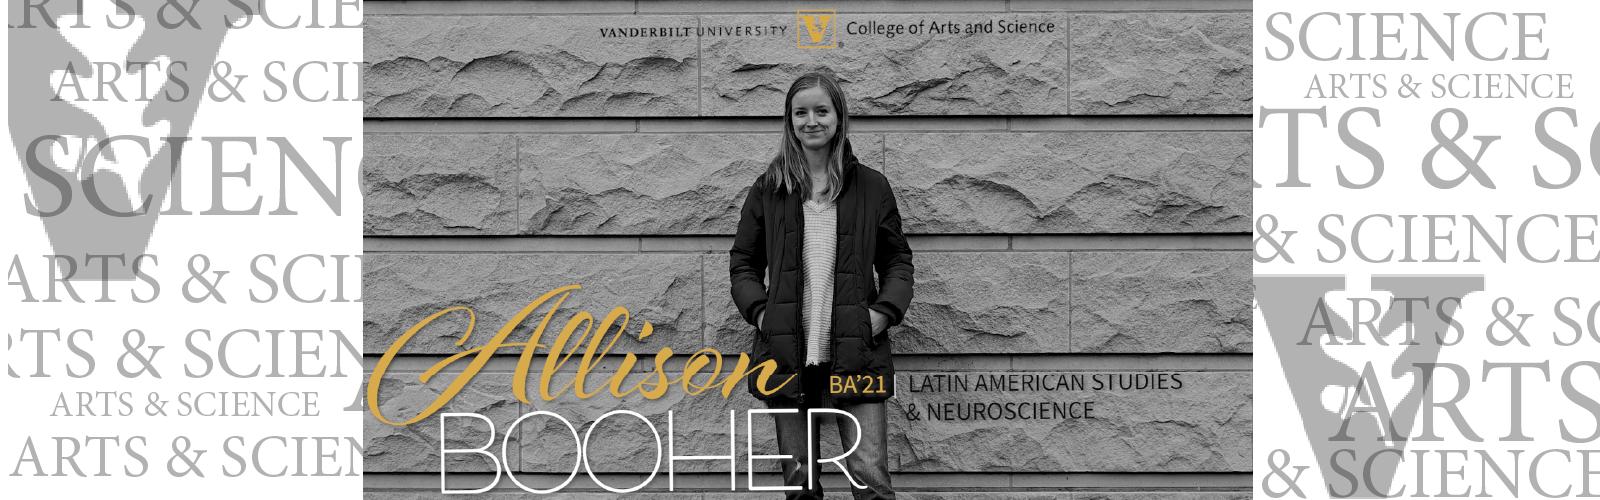 Student profile: Allison Booher (BA'21) Latin American Studies & Neuroscience